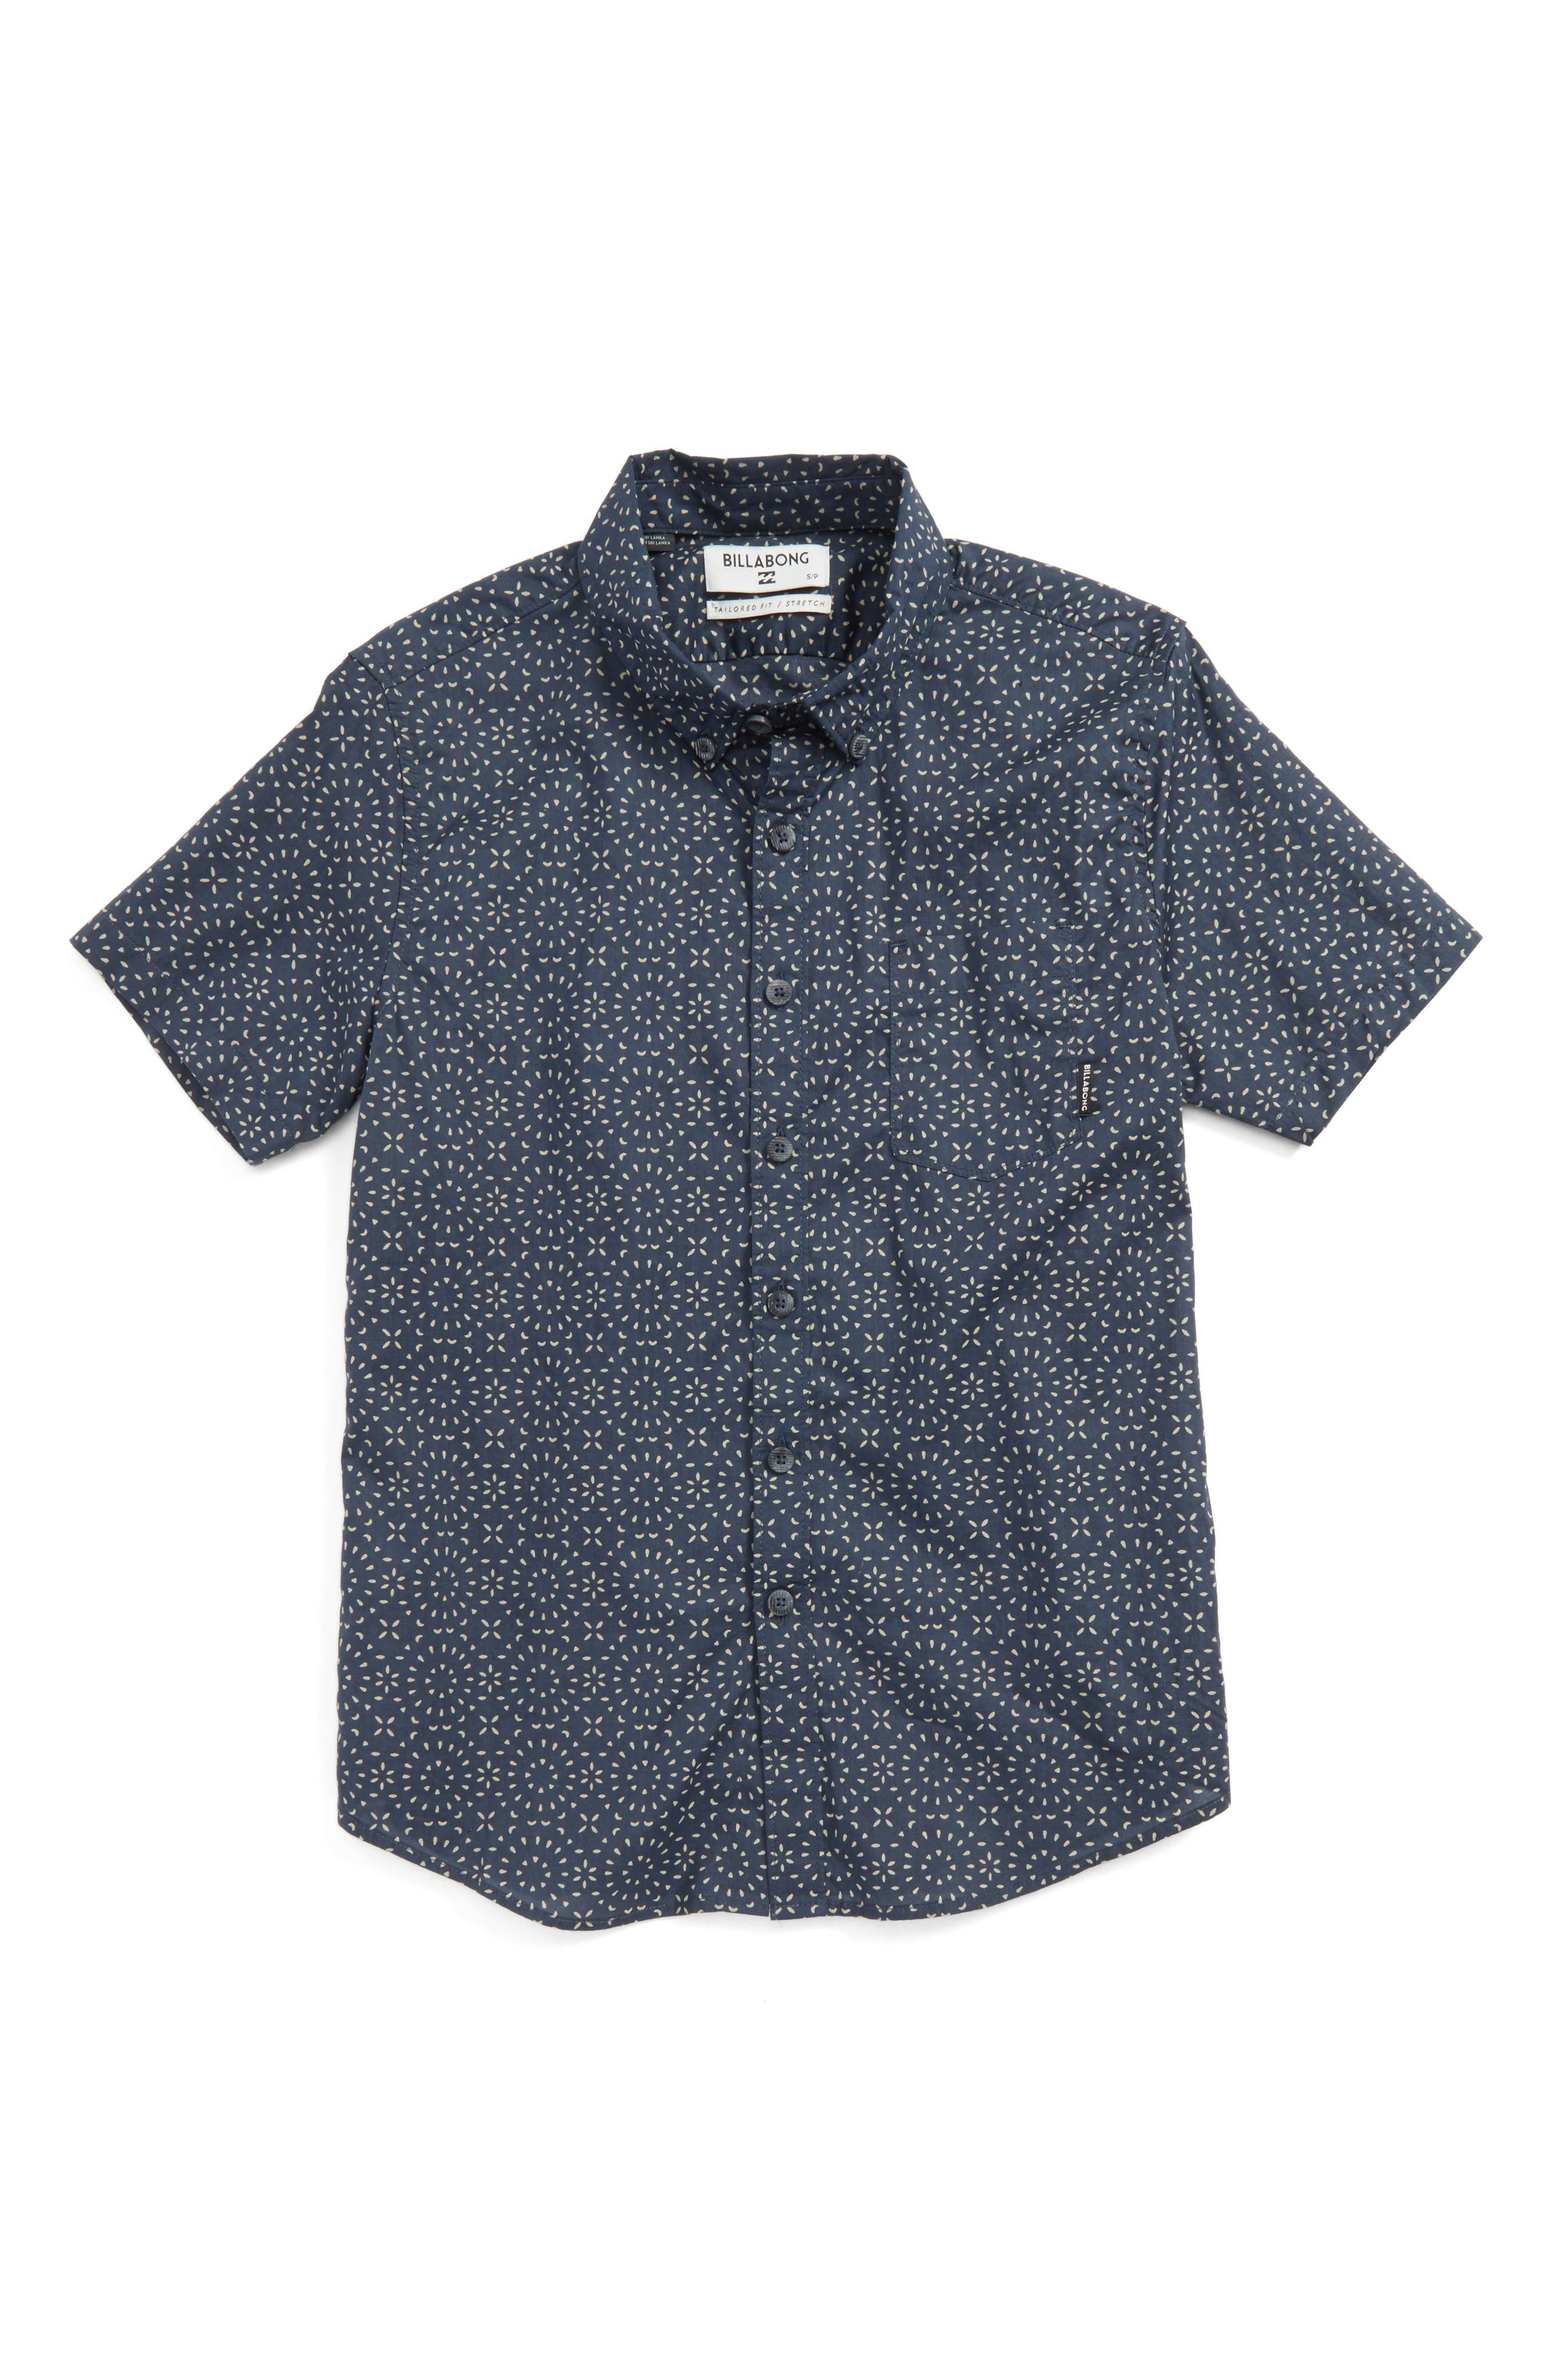 Billabong Sundays Mini Woven Shirt (Big Boys)